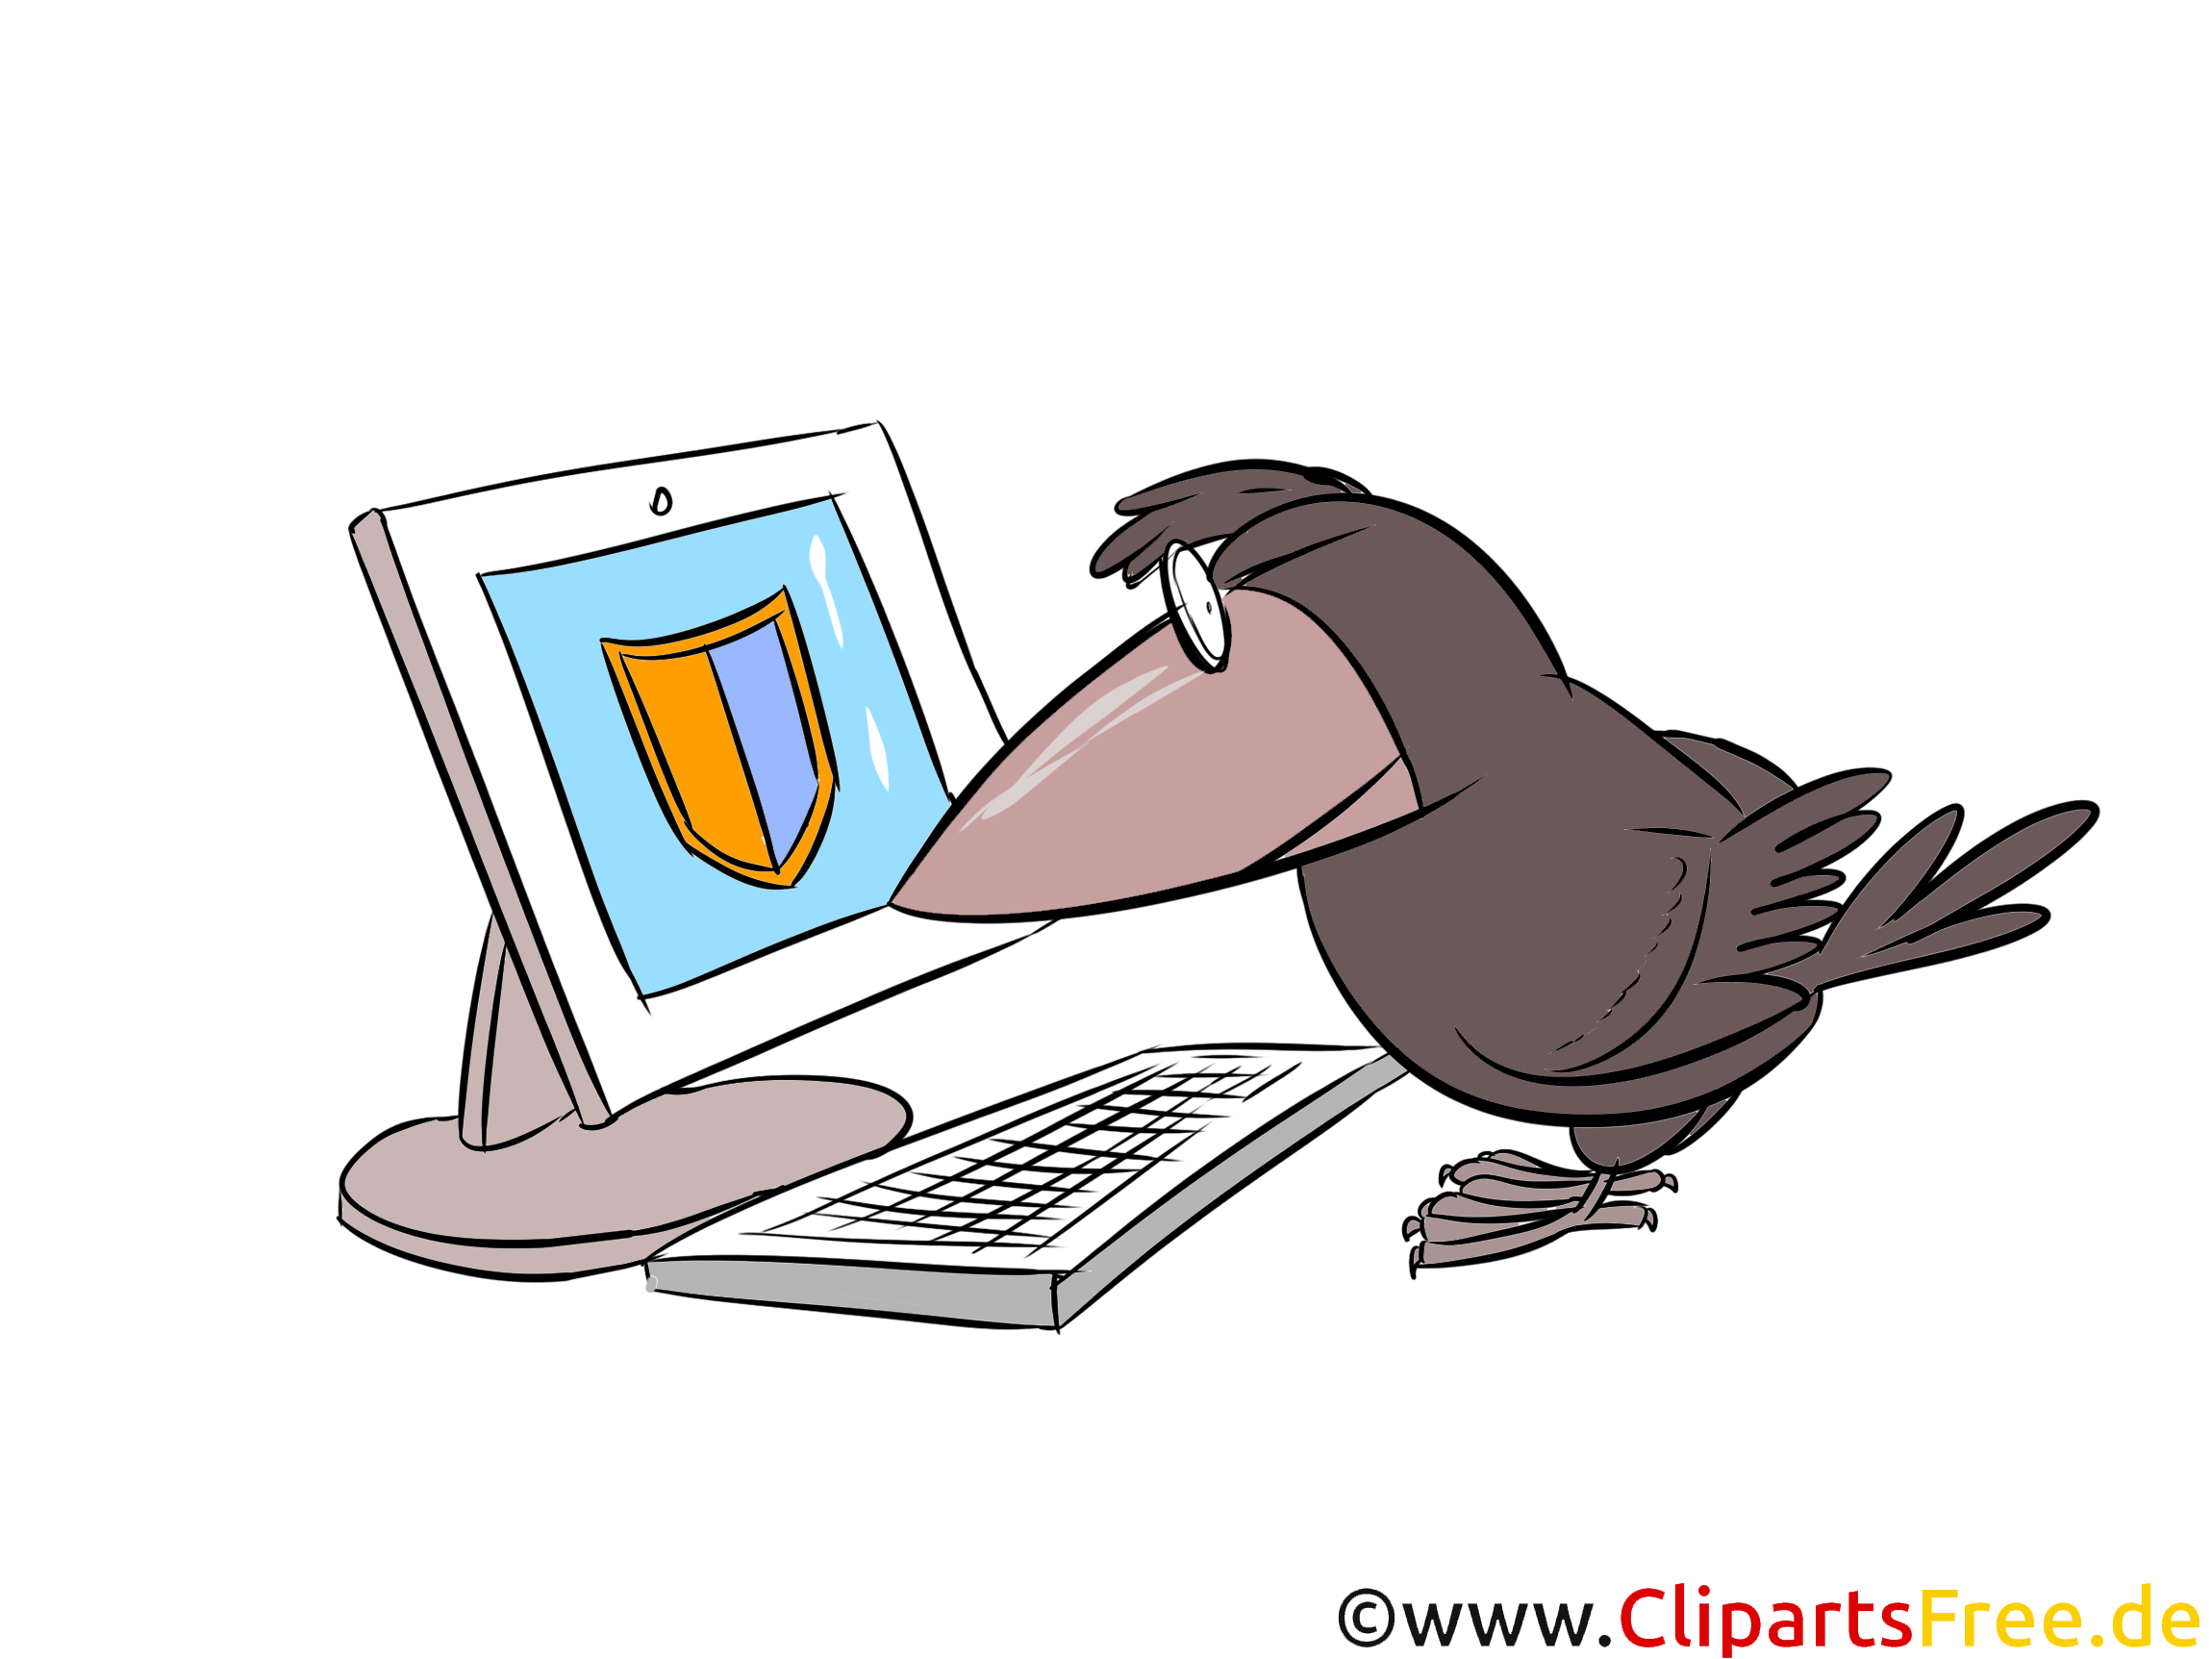 Information Security Clip Art, Illustration free